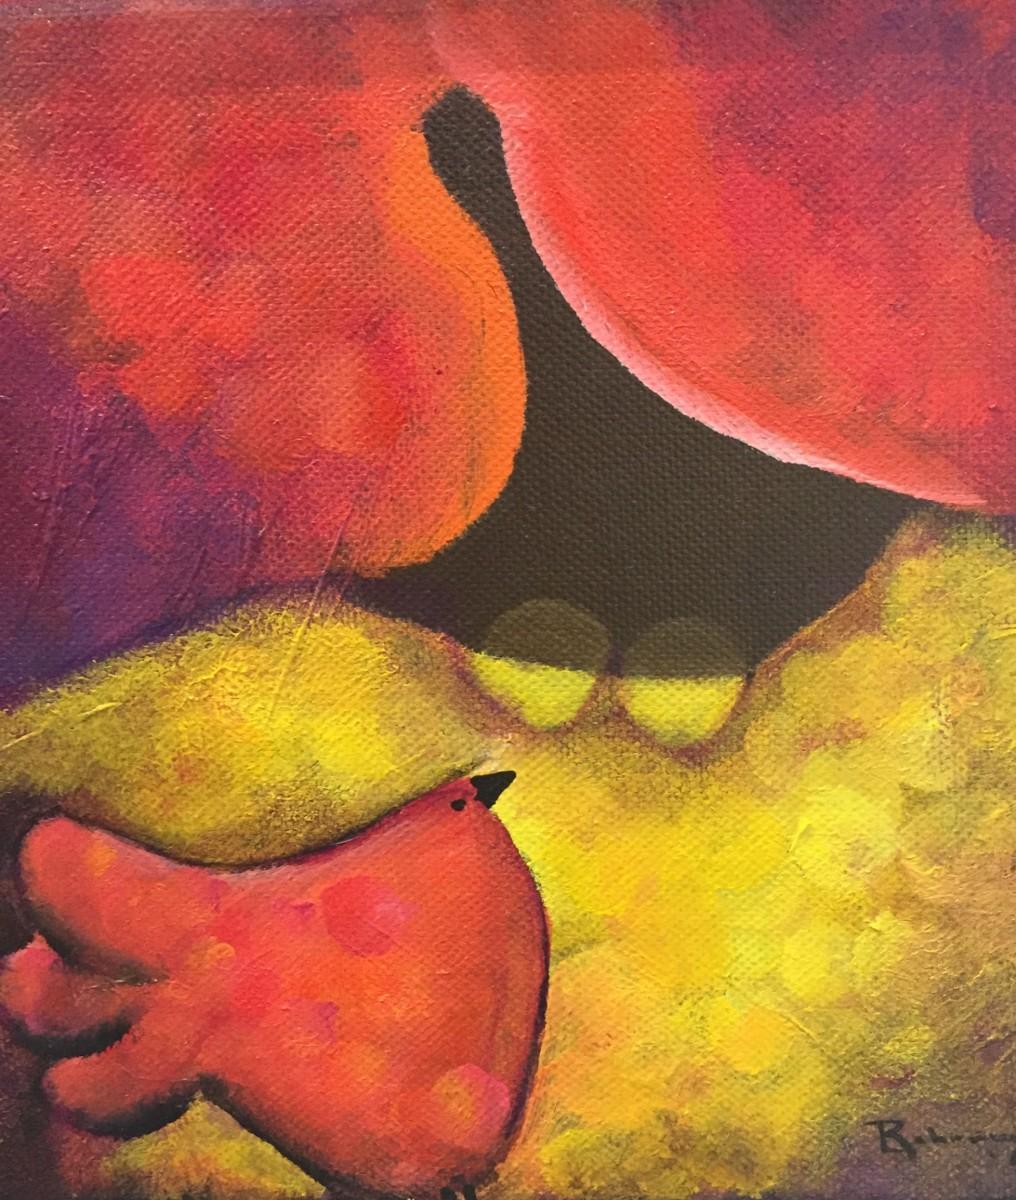 """EDUVIGES"" by LUCIAROHRMANN"